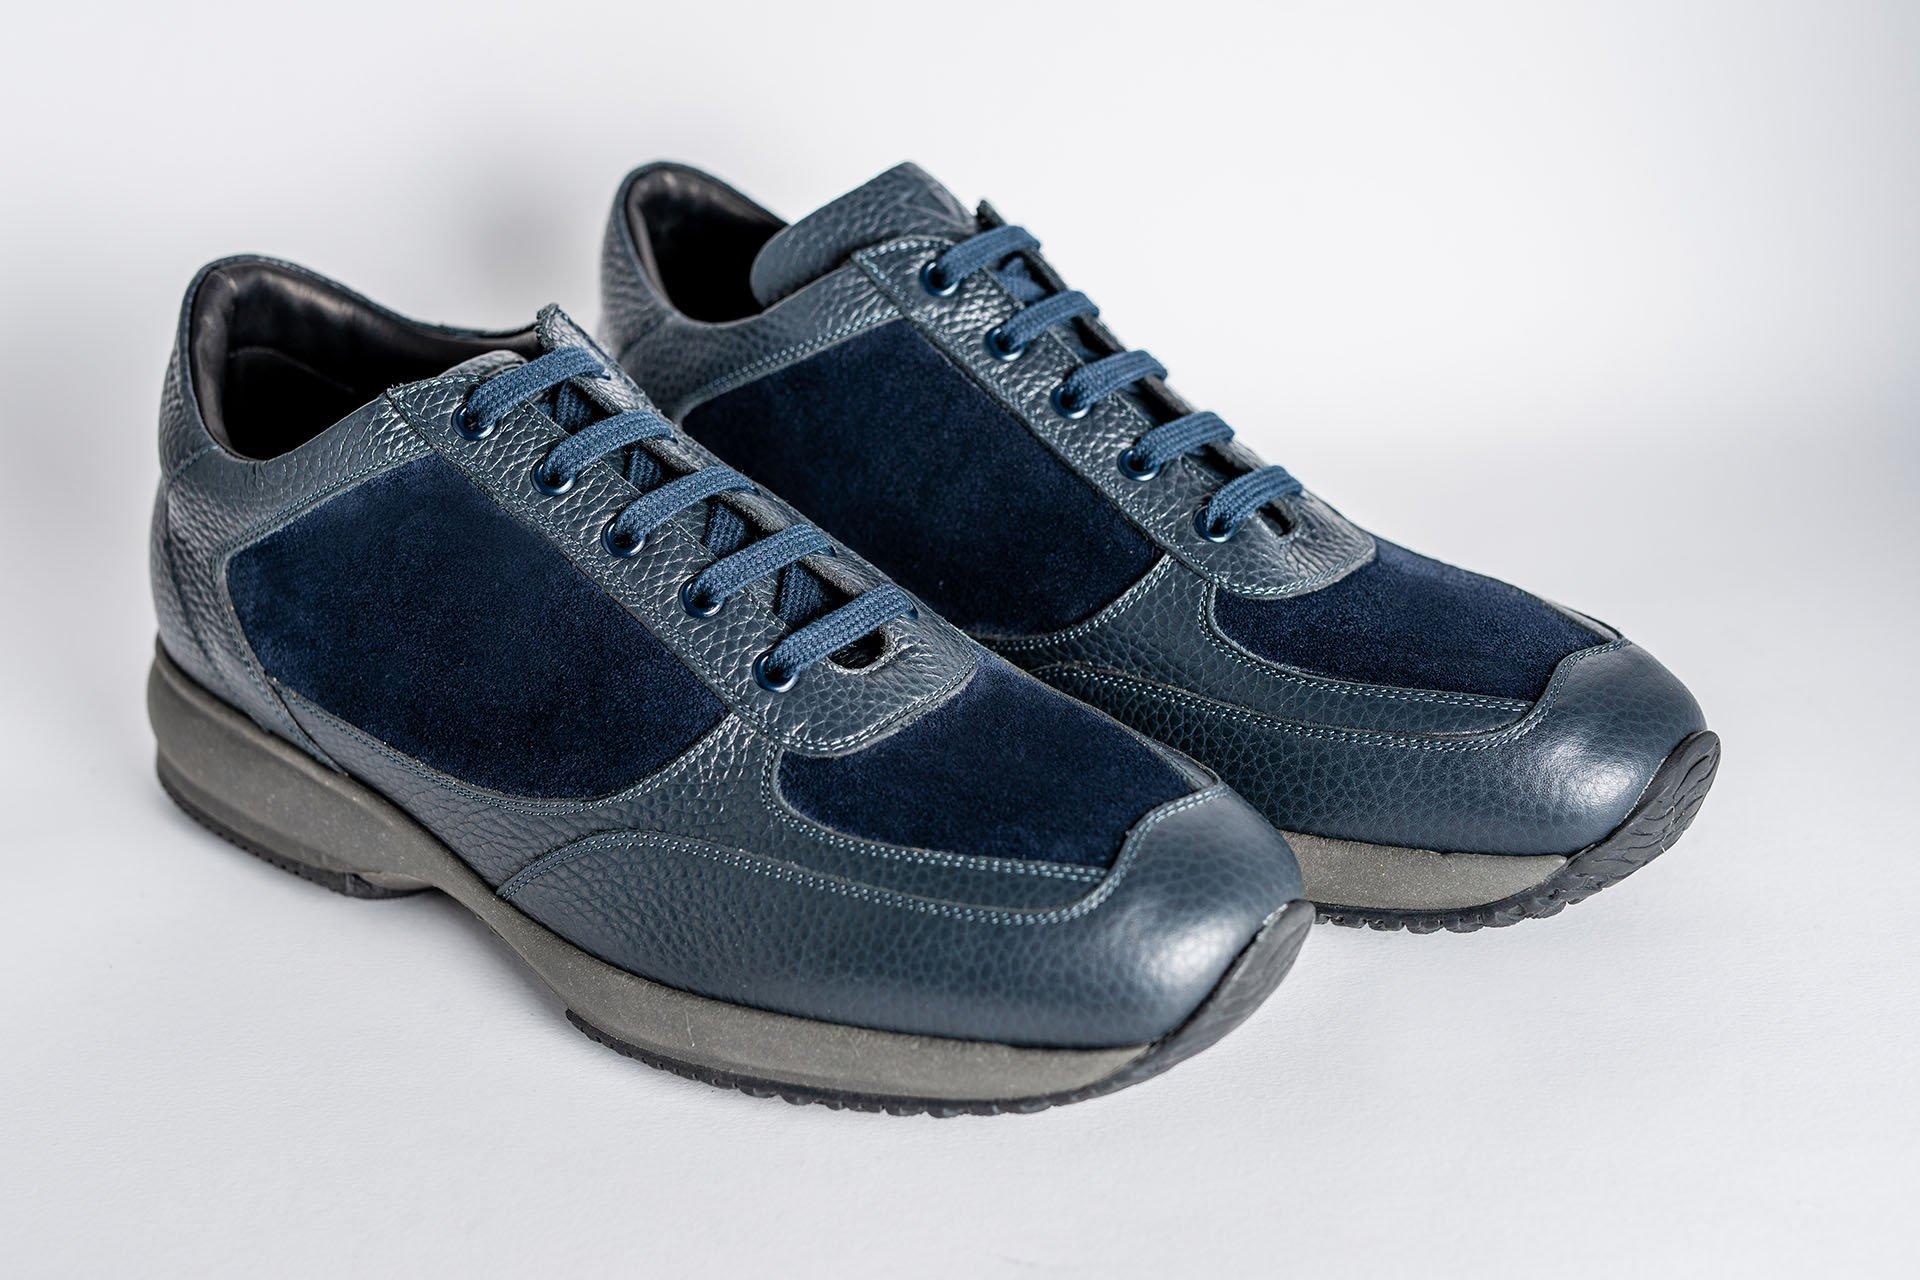 Sportiva-vitello-bottalato-camoscio-blu-1